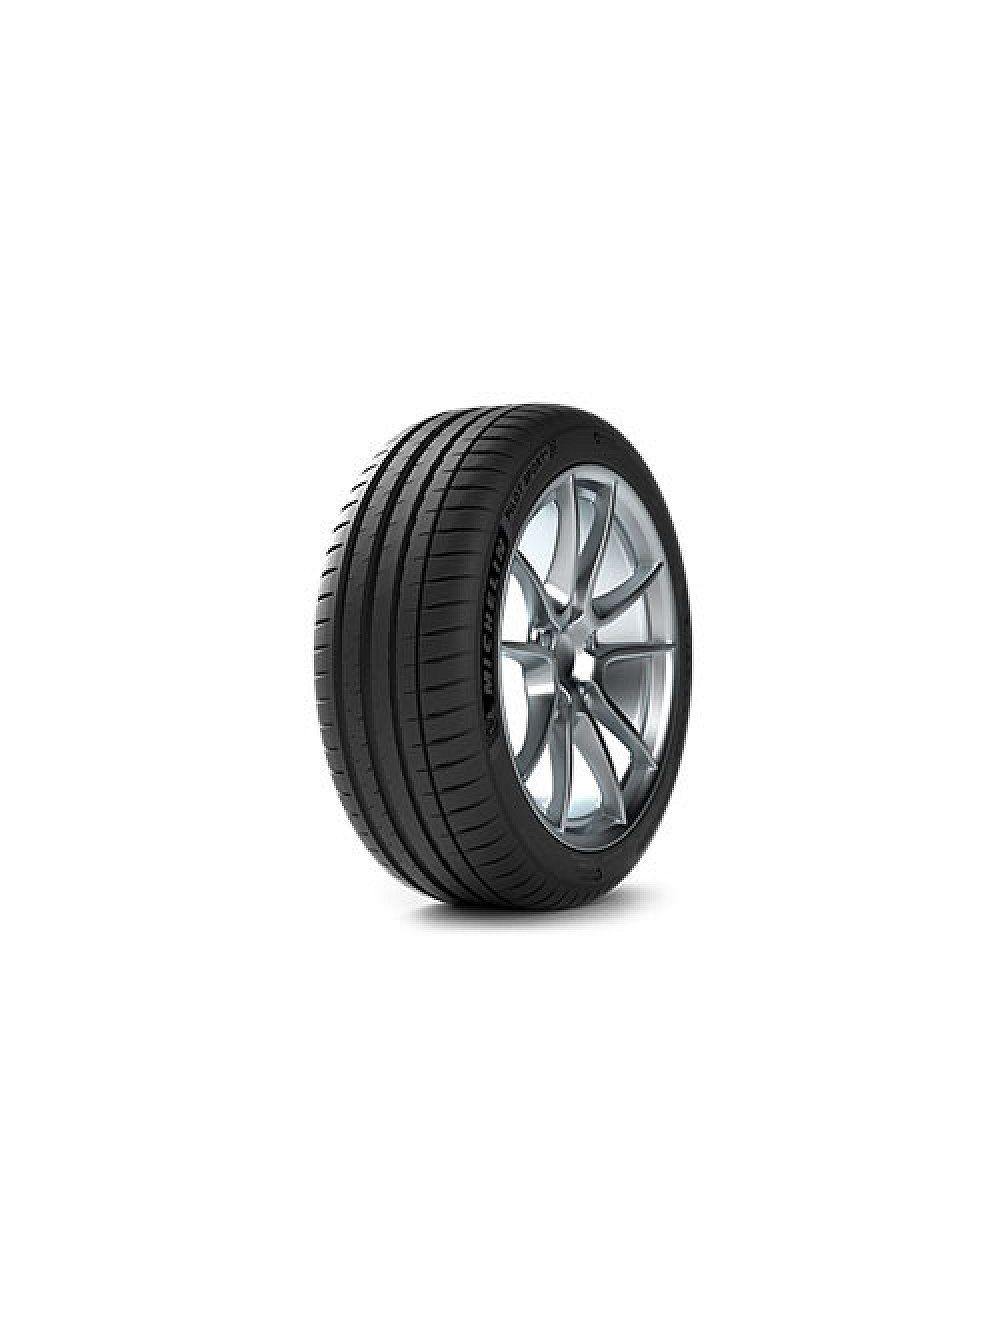 Michelin 275/35R20 Y Pilot Sport4 S XL * Nyári gumi